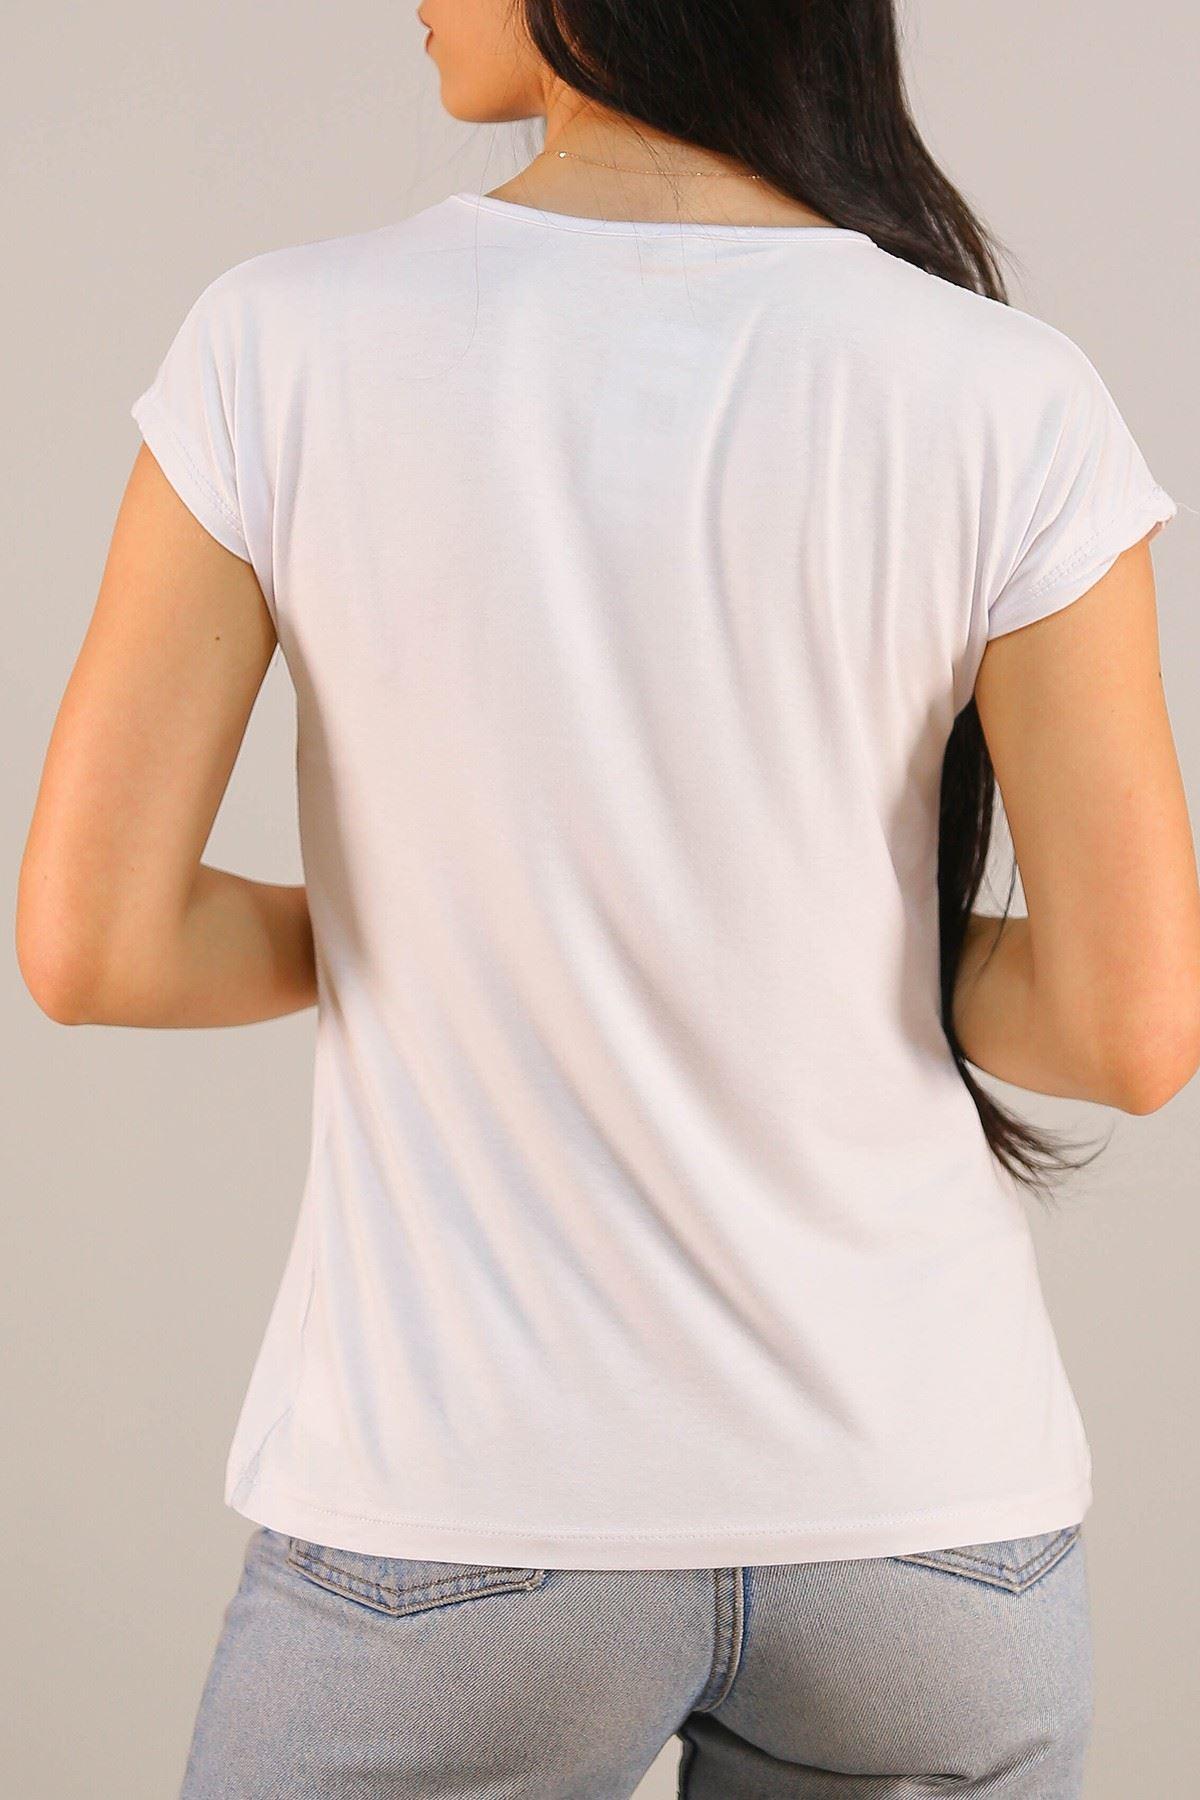 Quenn Baskı Tişört Beyaz - 5052.139.